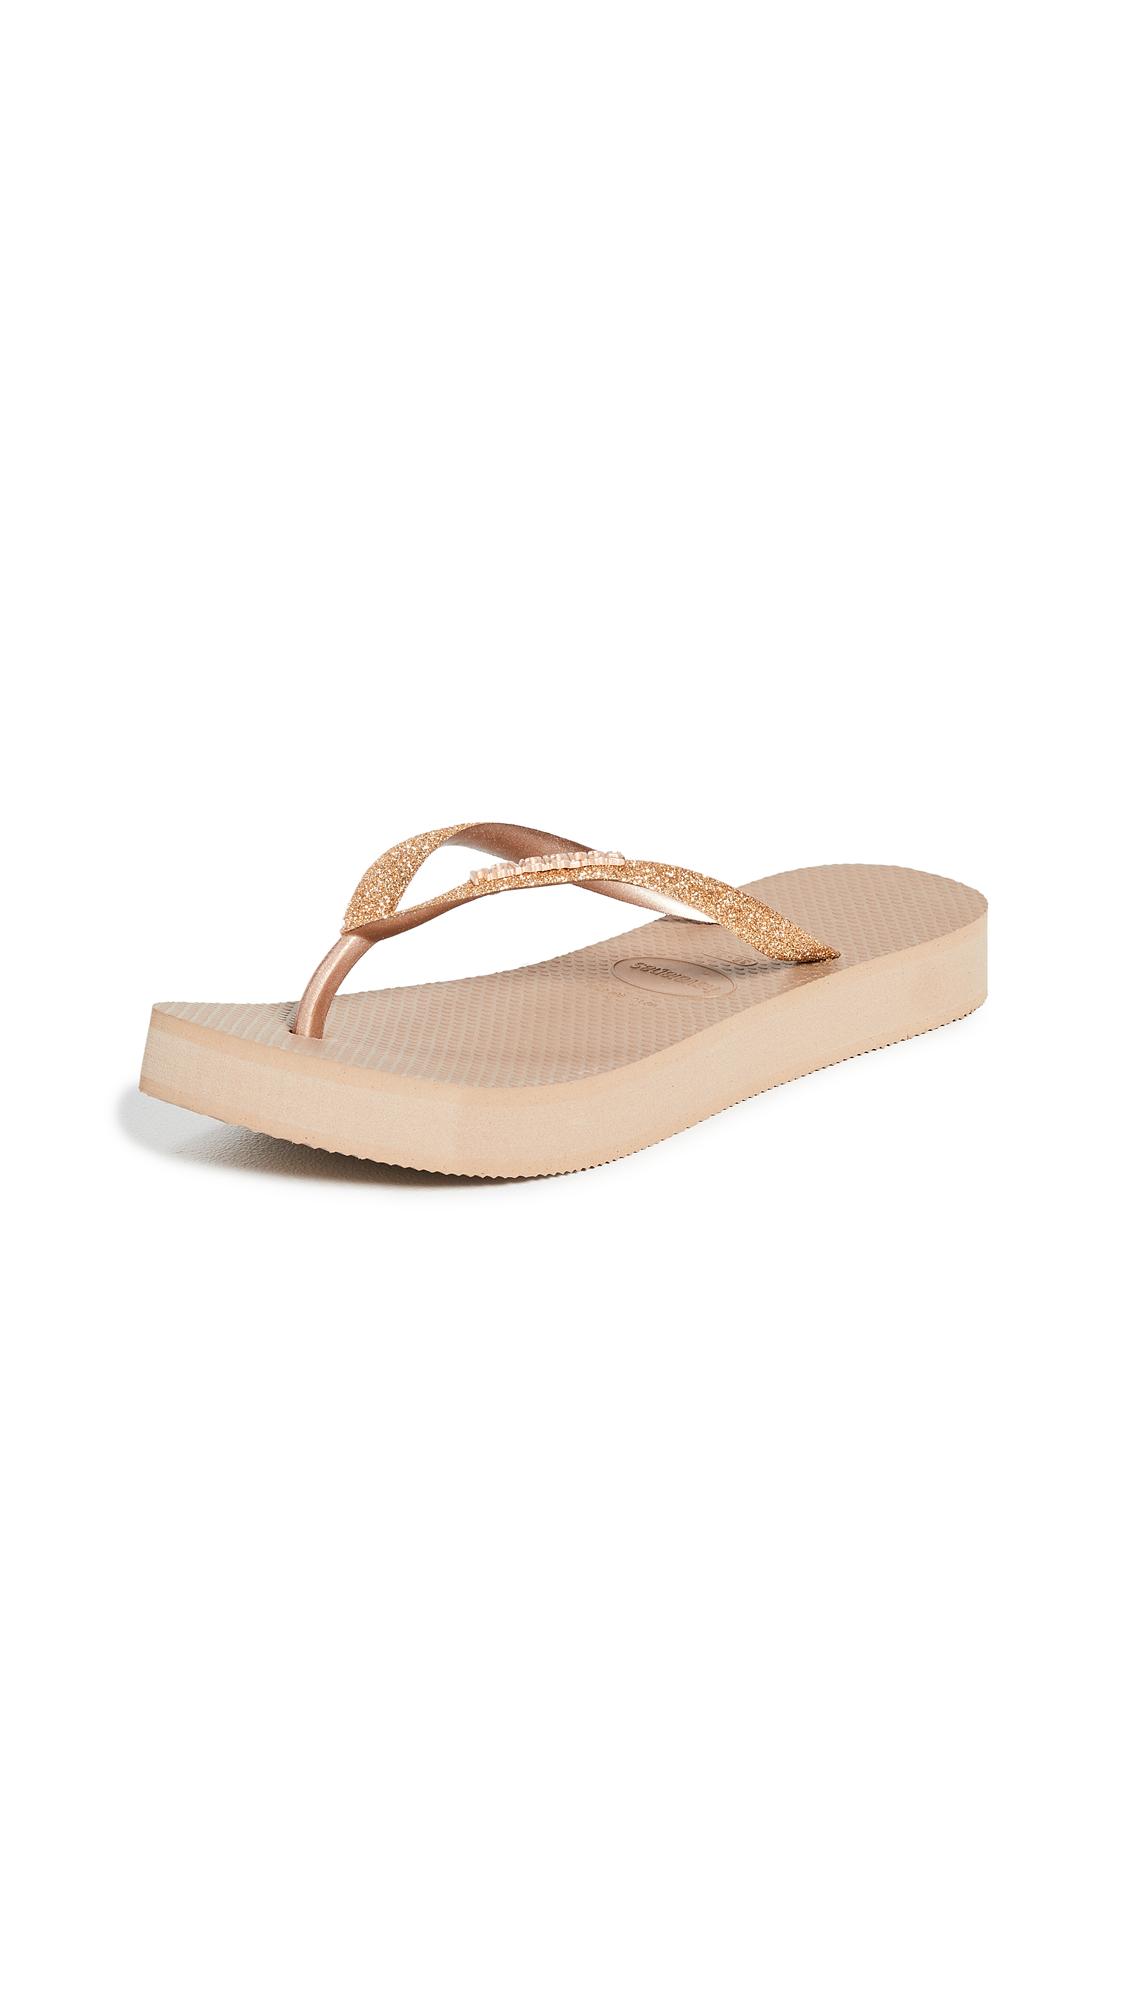 Buy Havaianas Slim Flatform Glitter Sandals online, shop Havaianas